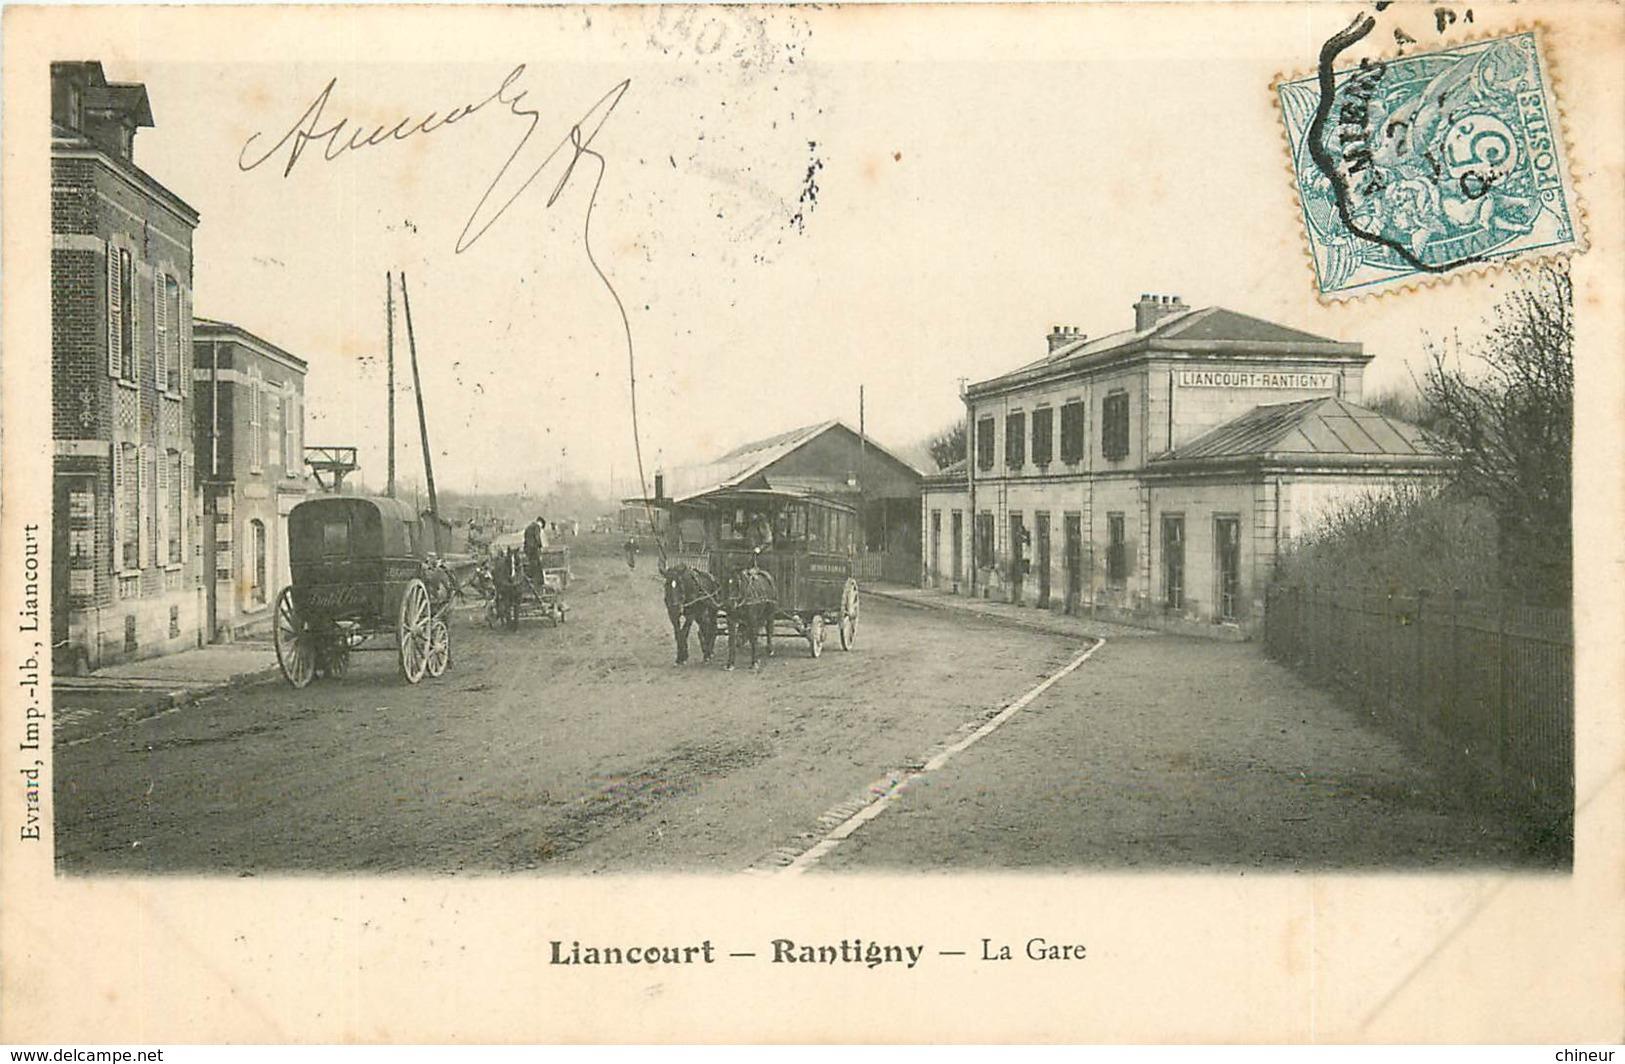 LIANCOURT RANTIGNY LA GARE - Liancourt